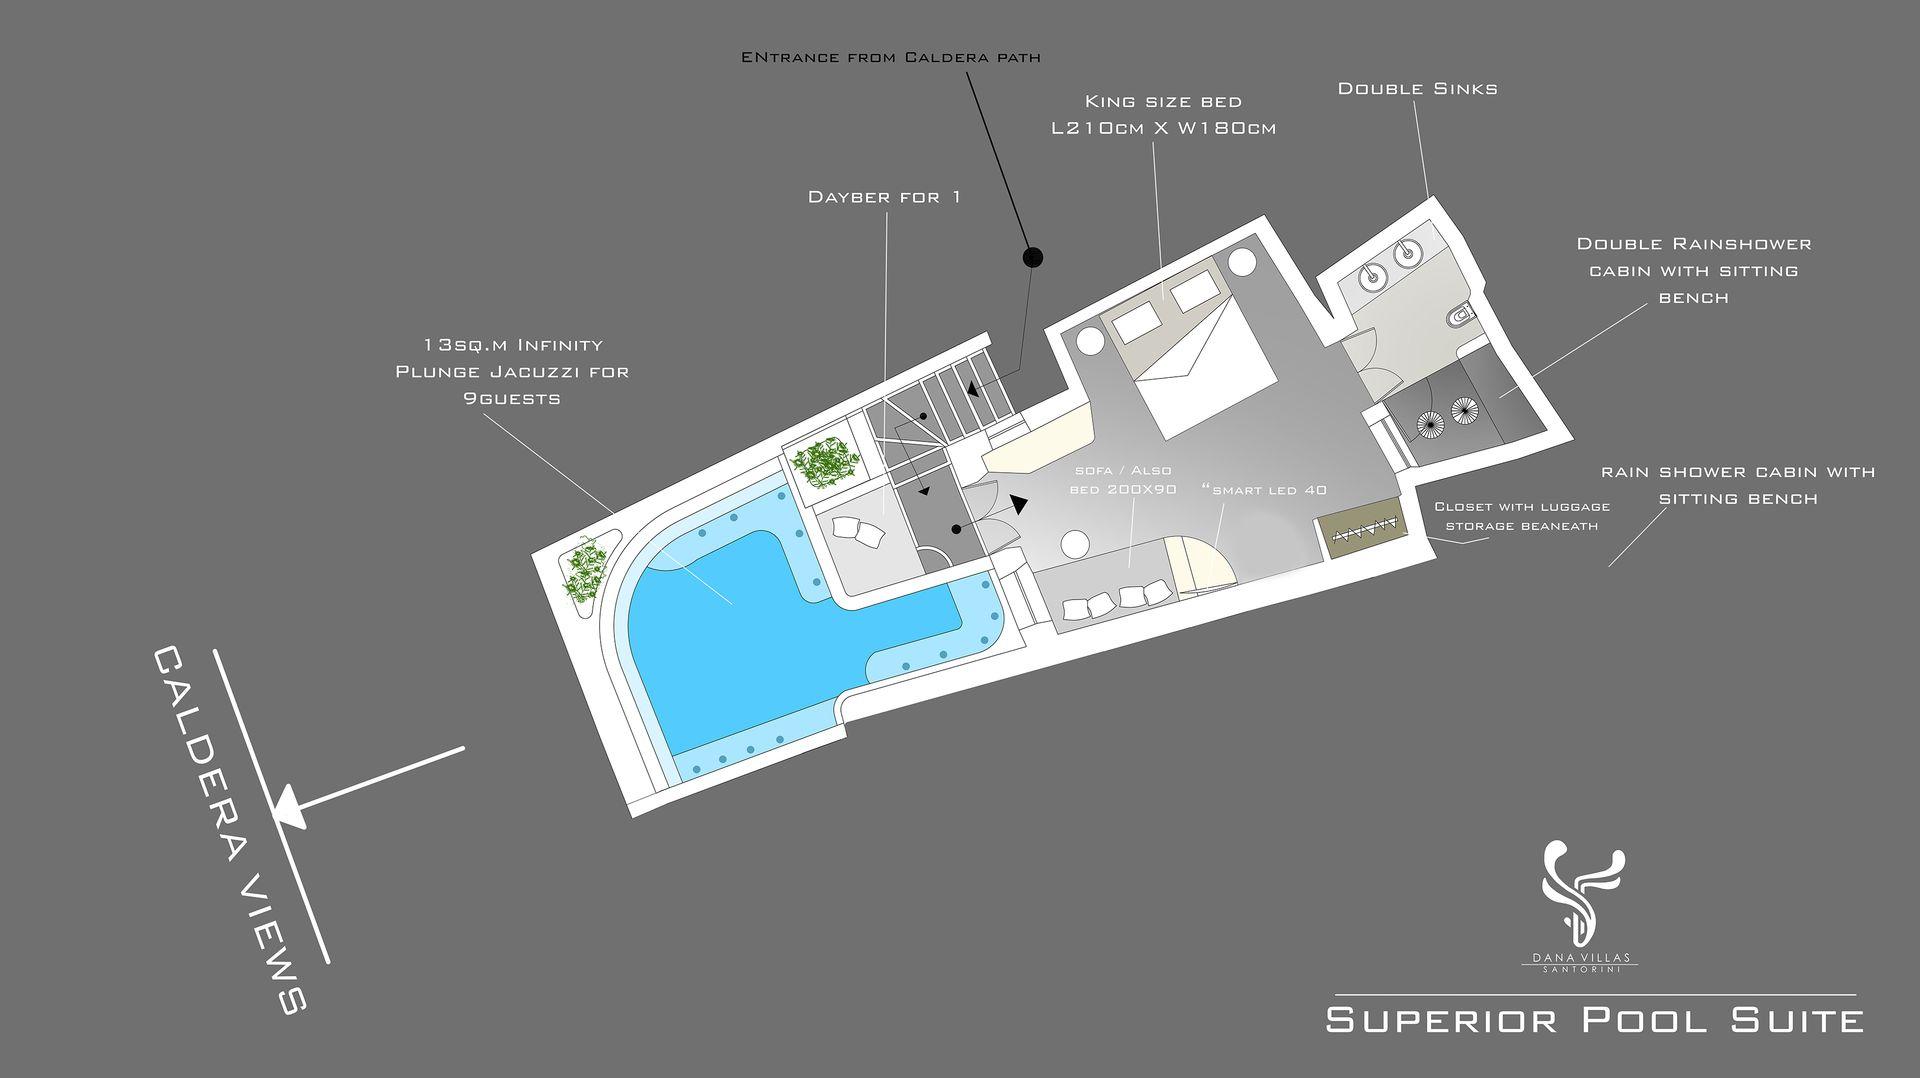 Superior Pool Suite Outdoor Infinity Plunge Pool Dana